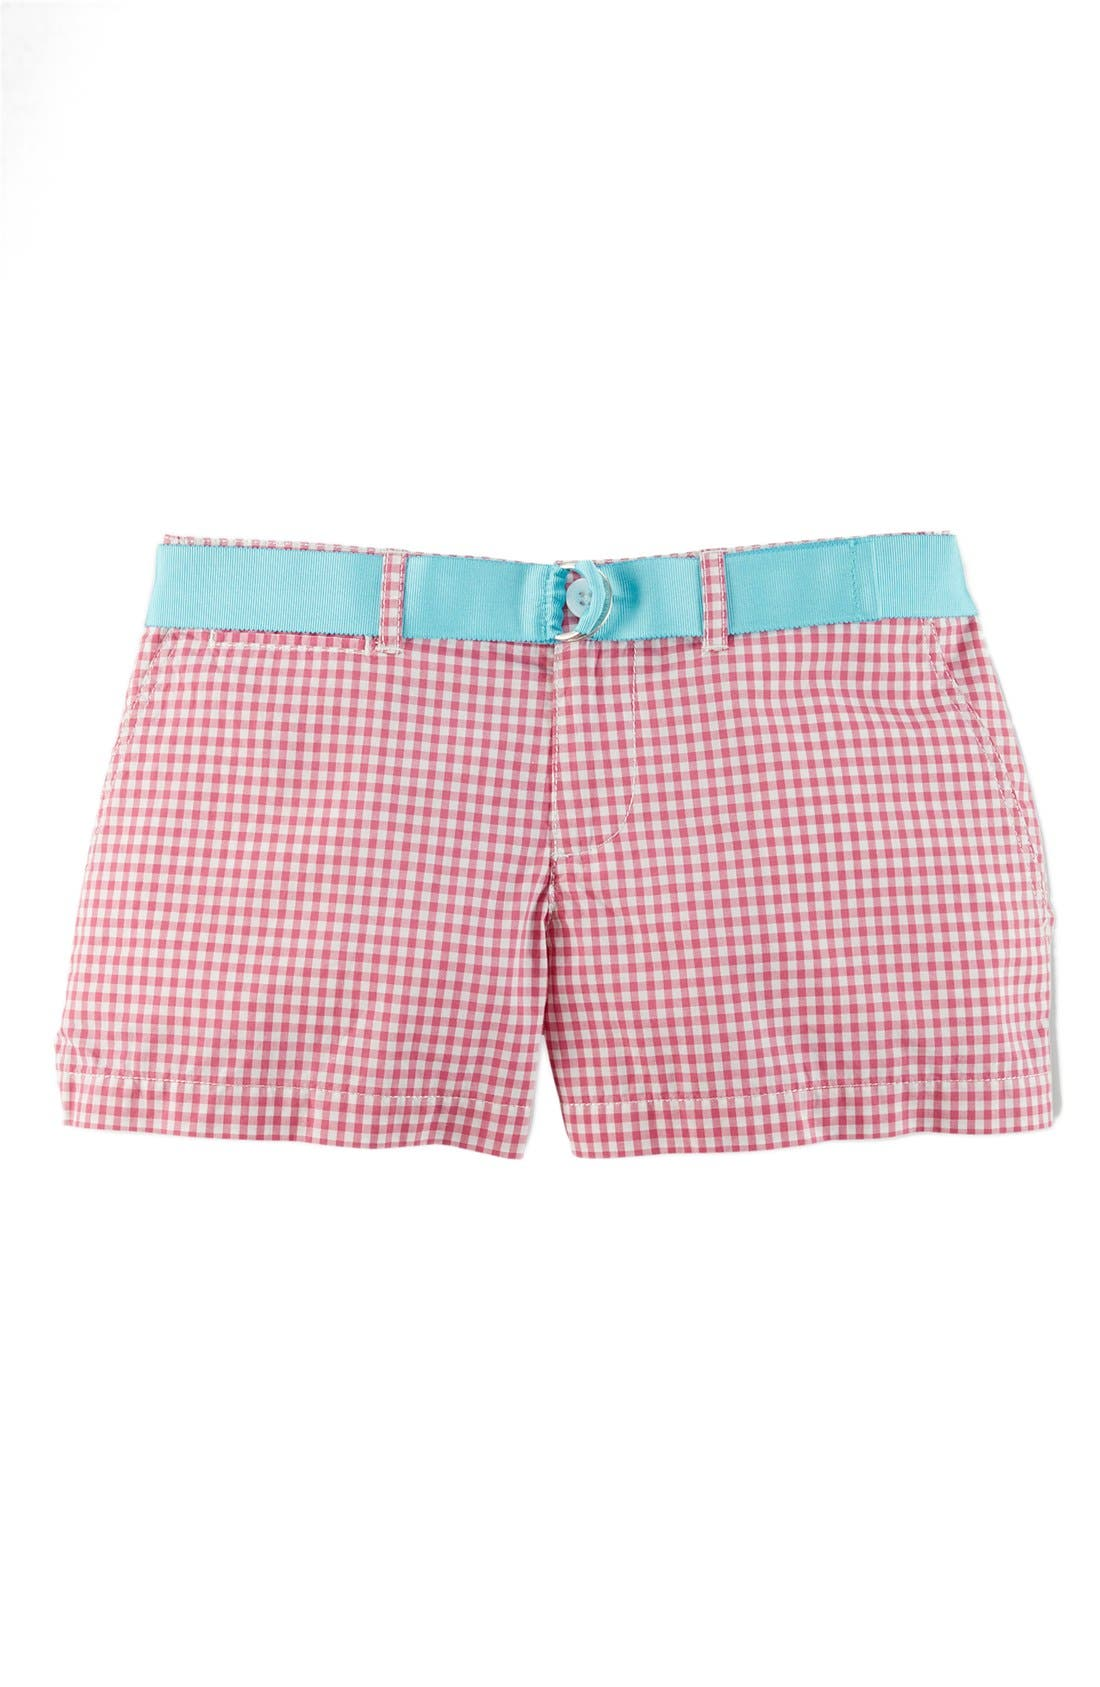 Alternate Image 1 Selected - Ralph Lauren Gingham Cotton Poplin Shorts (Big Girls)